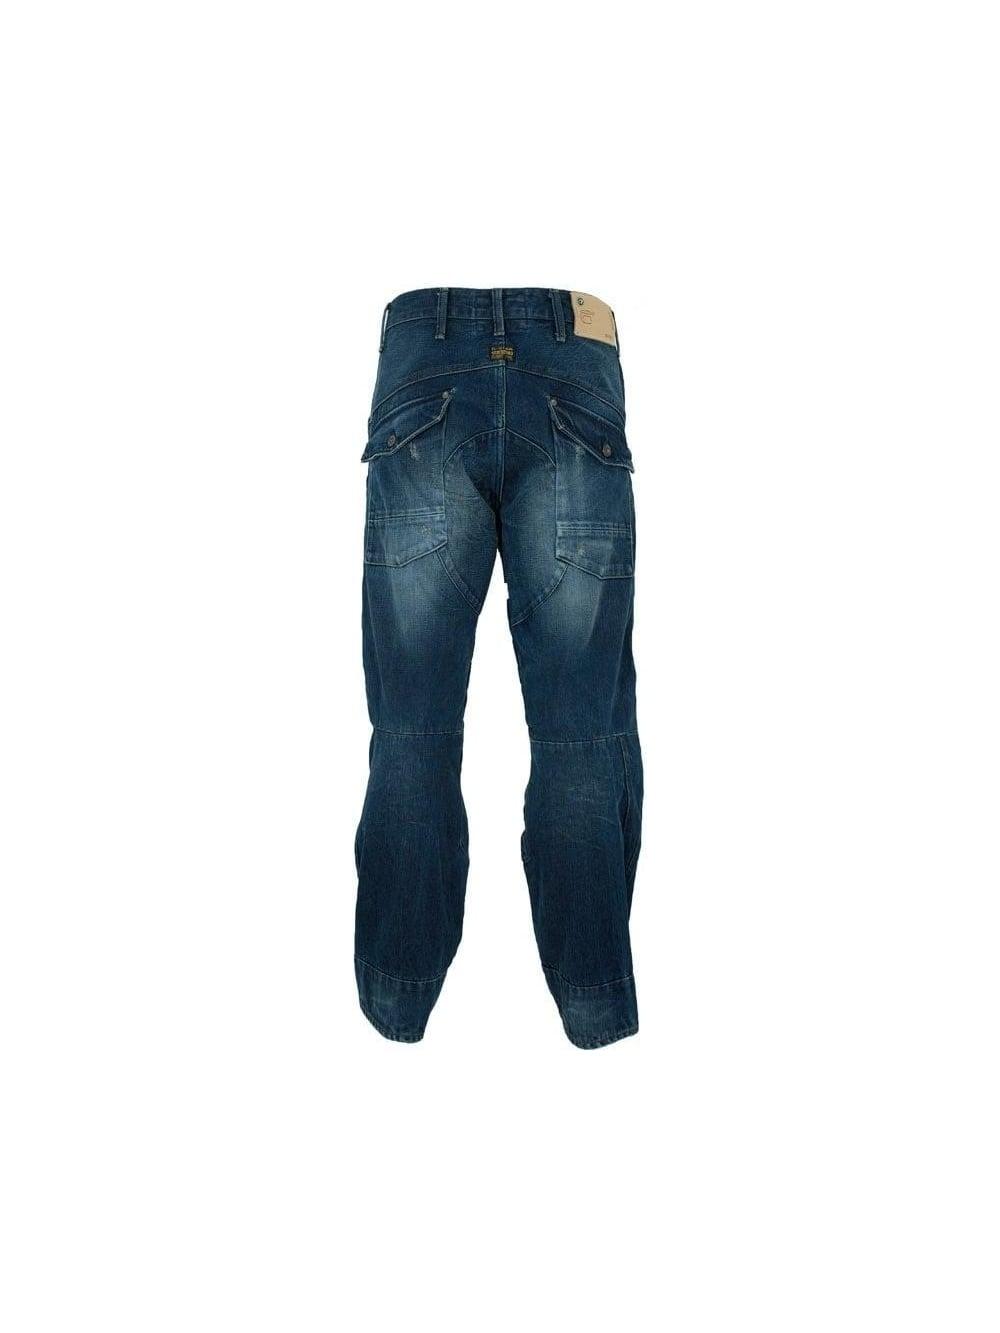 g star raw scuba 5620 loose jean trash worn mens designer jeans at northern threads. Black Bedroom Furniture Sets. Home Design Ideas